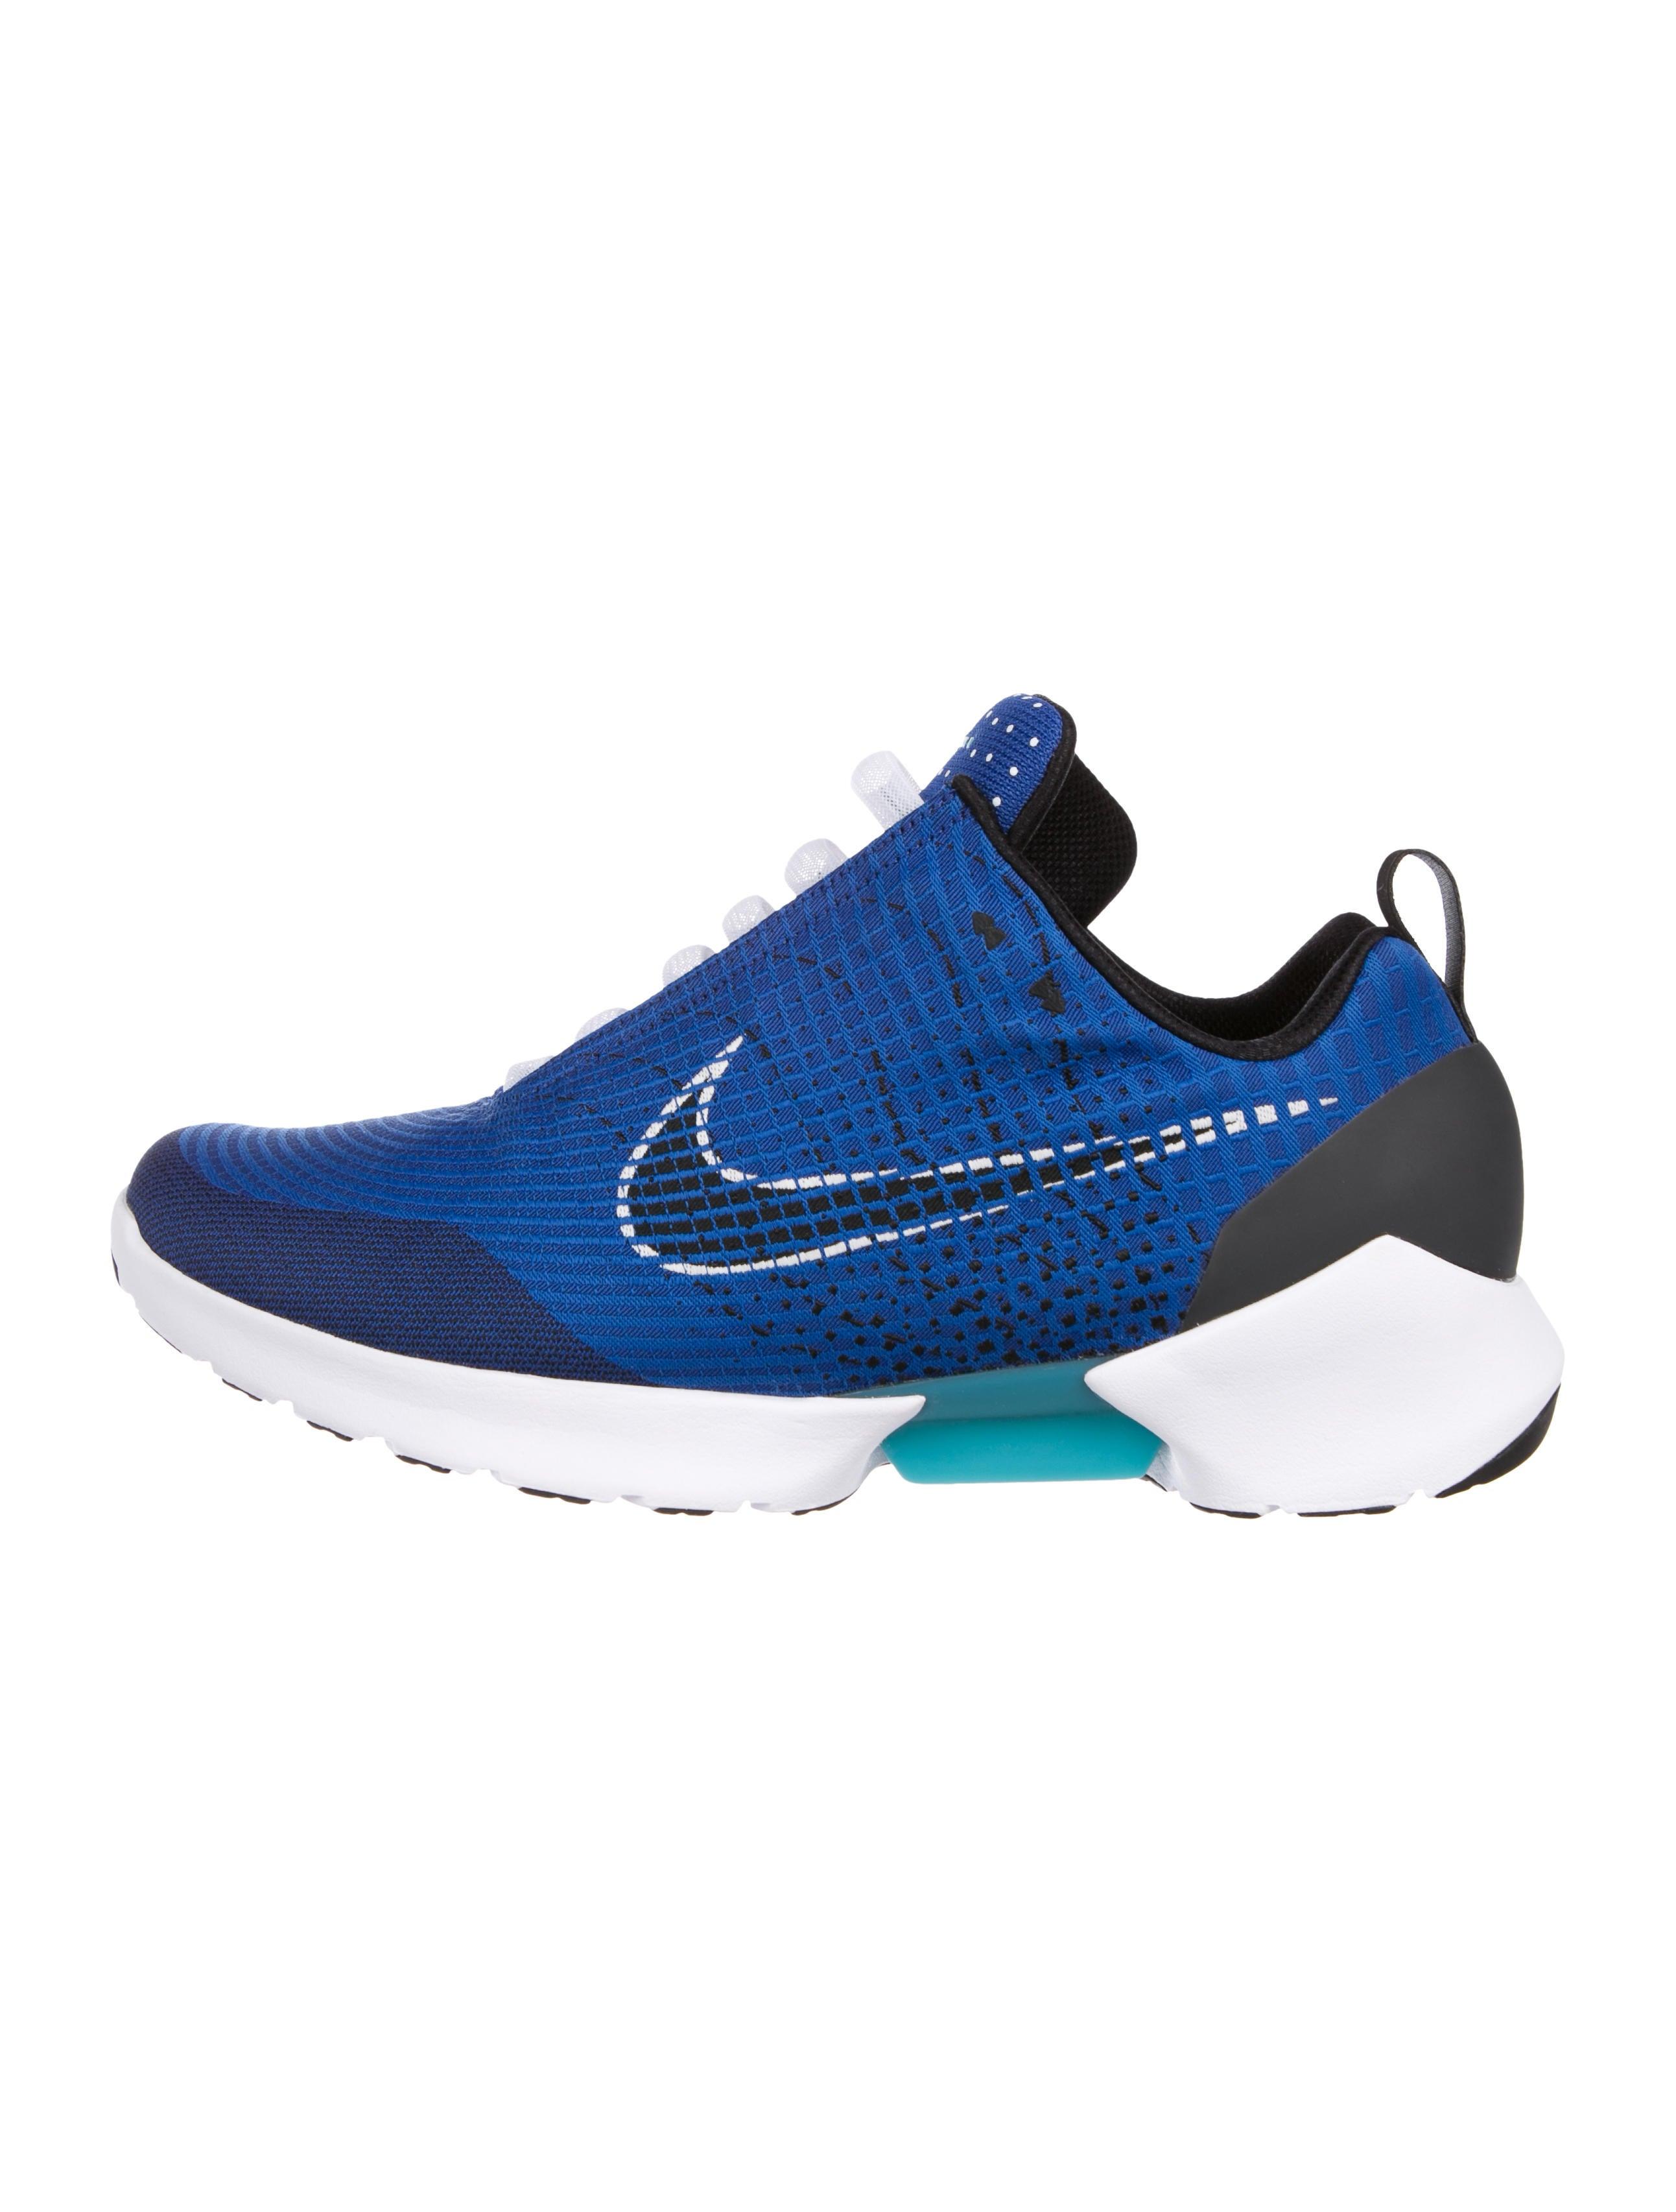 77ee5b19026e4 Future Tech Sneakers